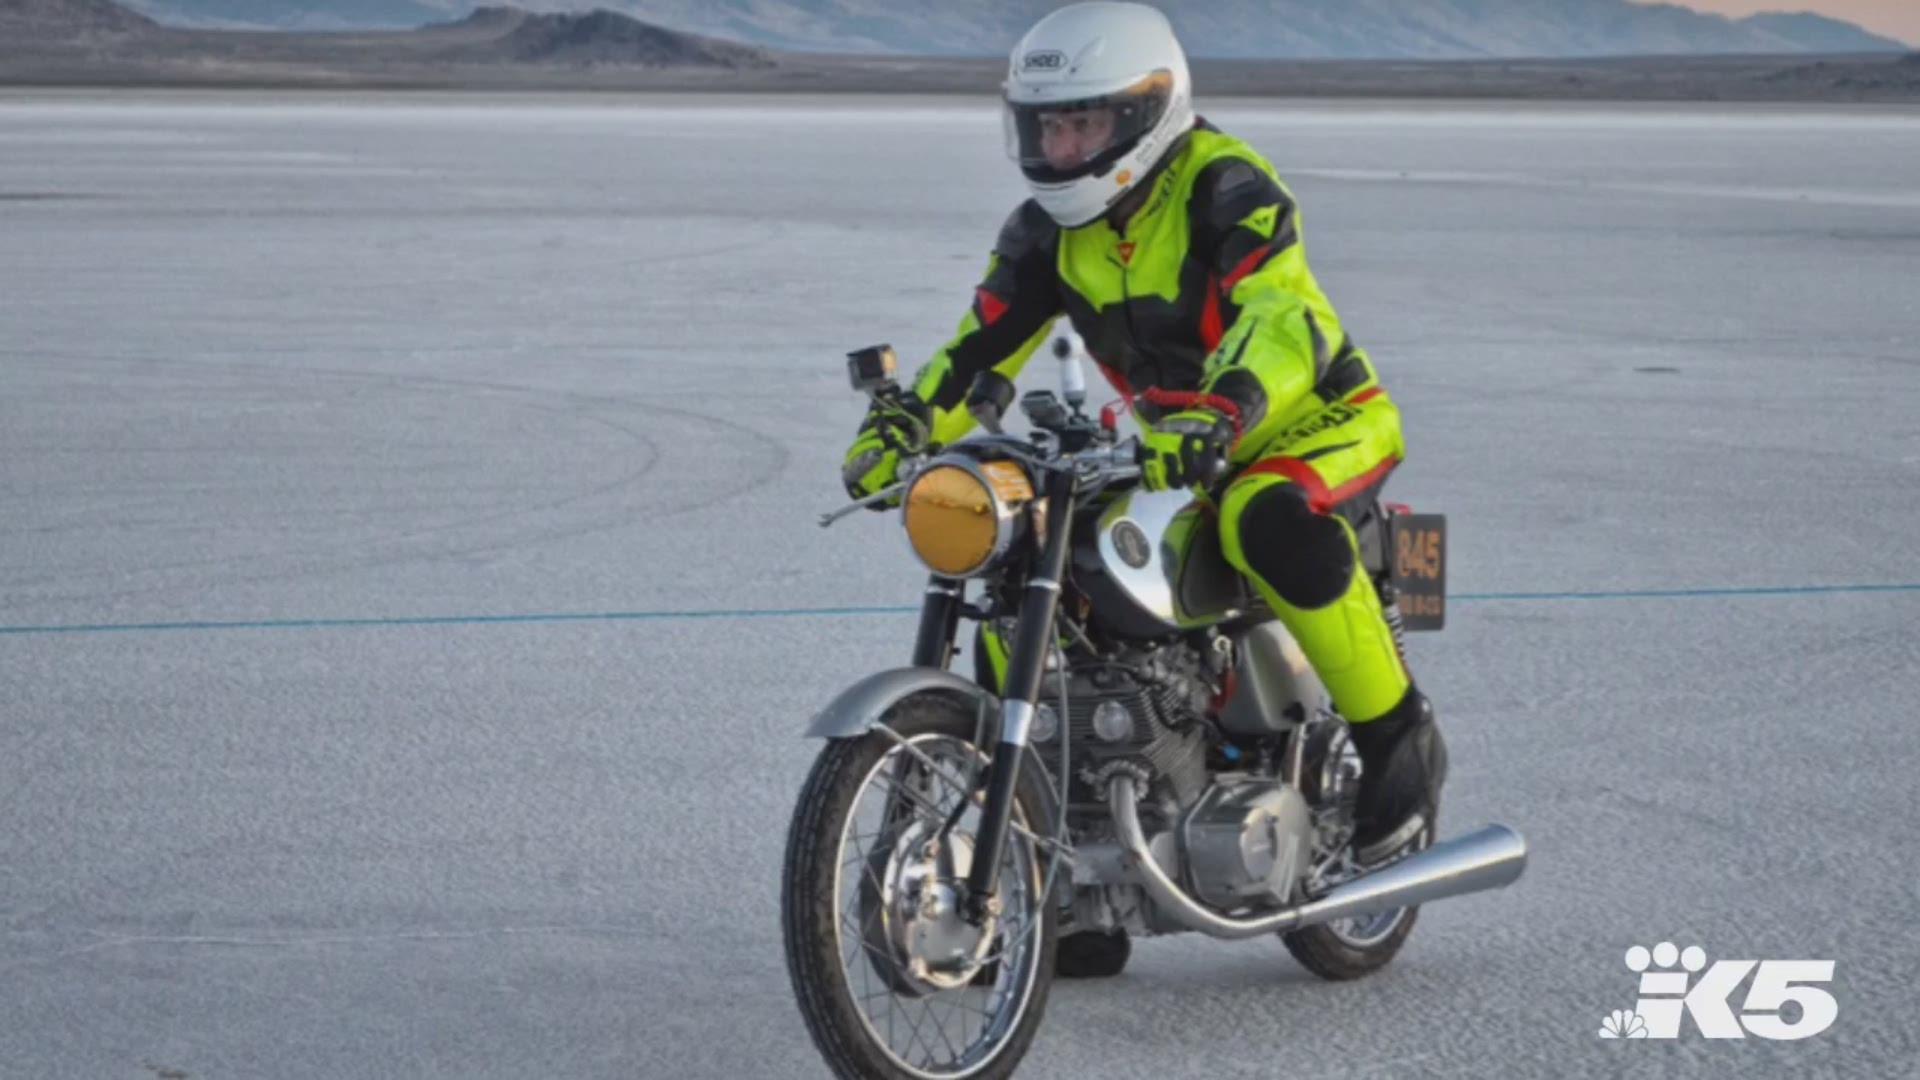 Craigslist Motorcycles Seattle Tacoma Area | Reviewmotors.co